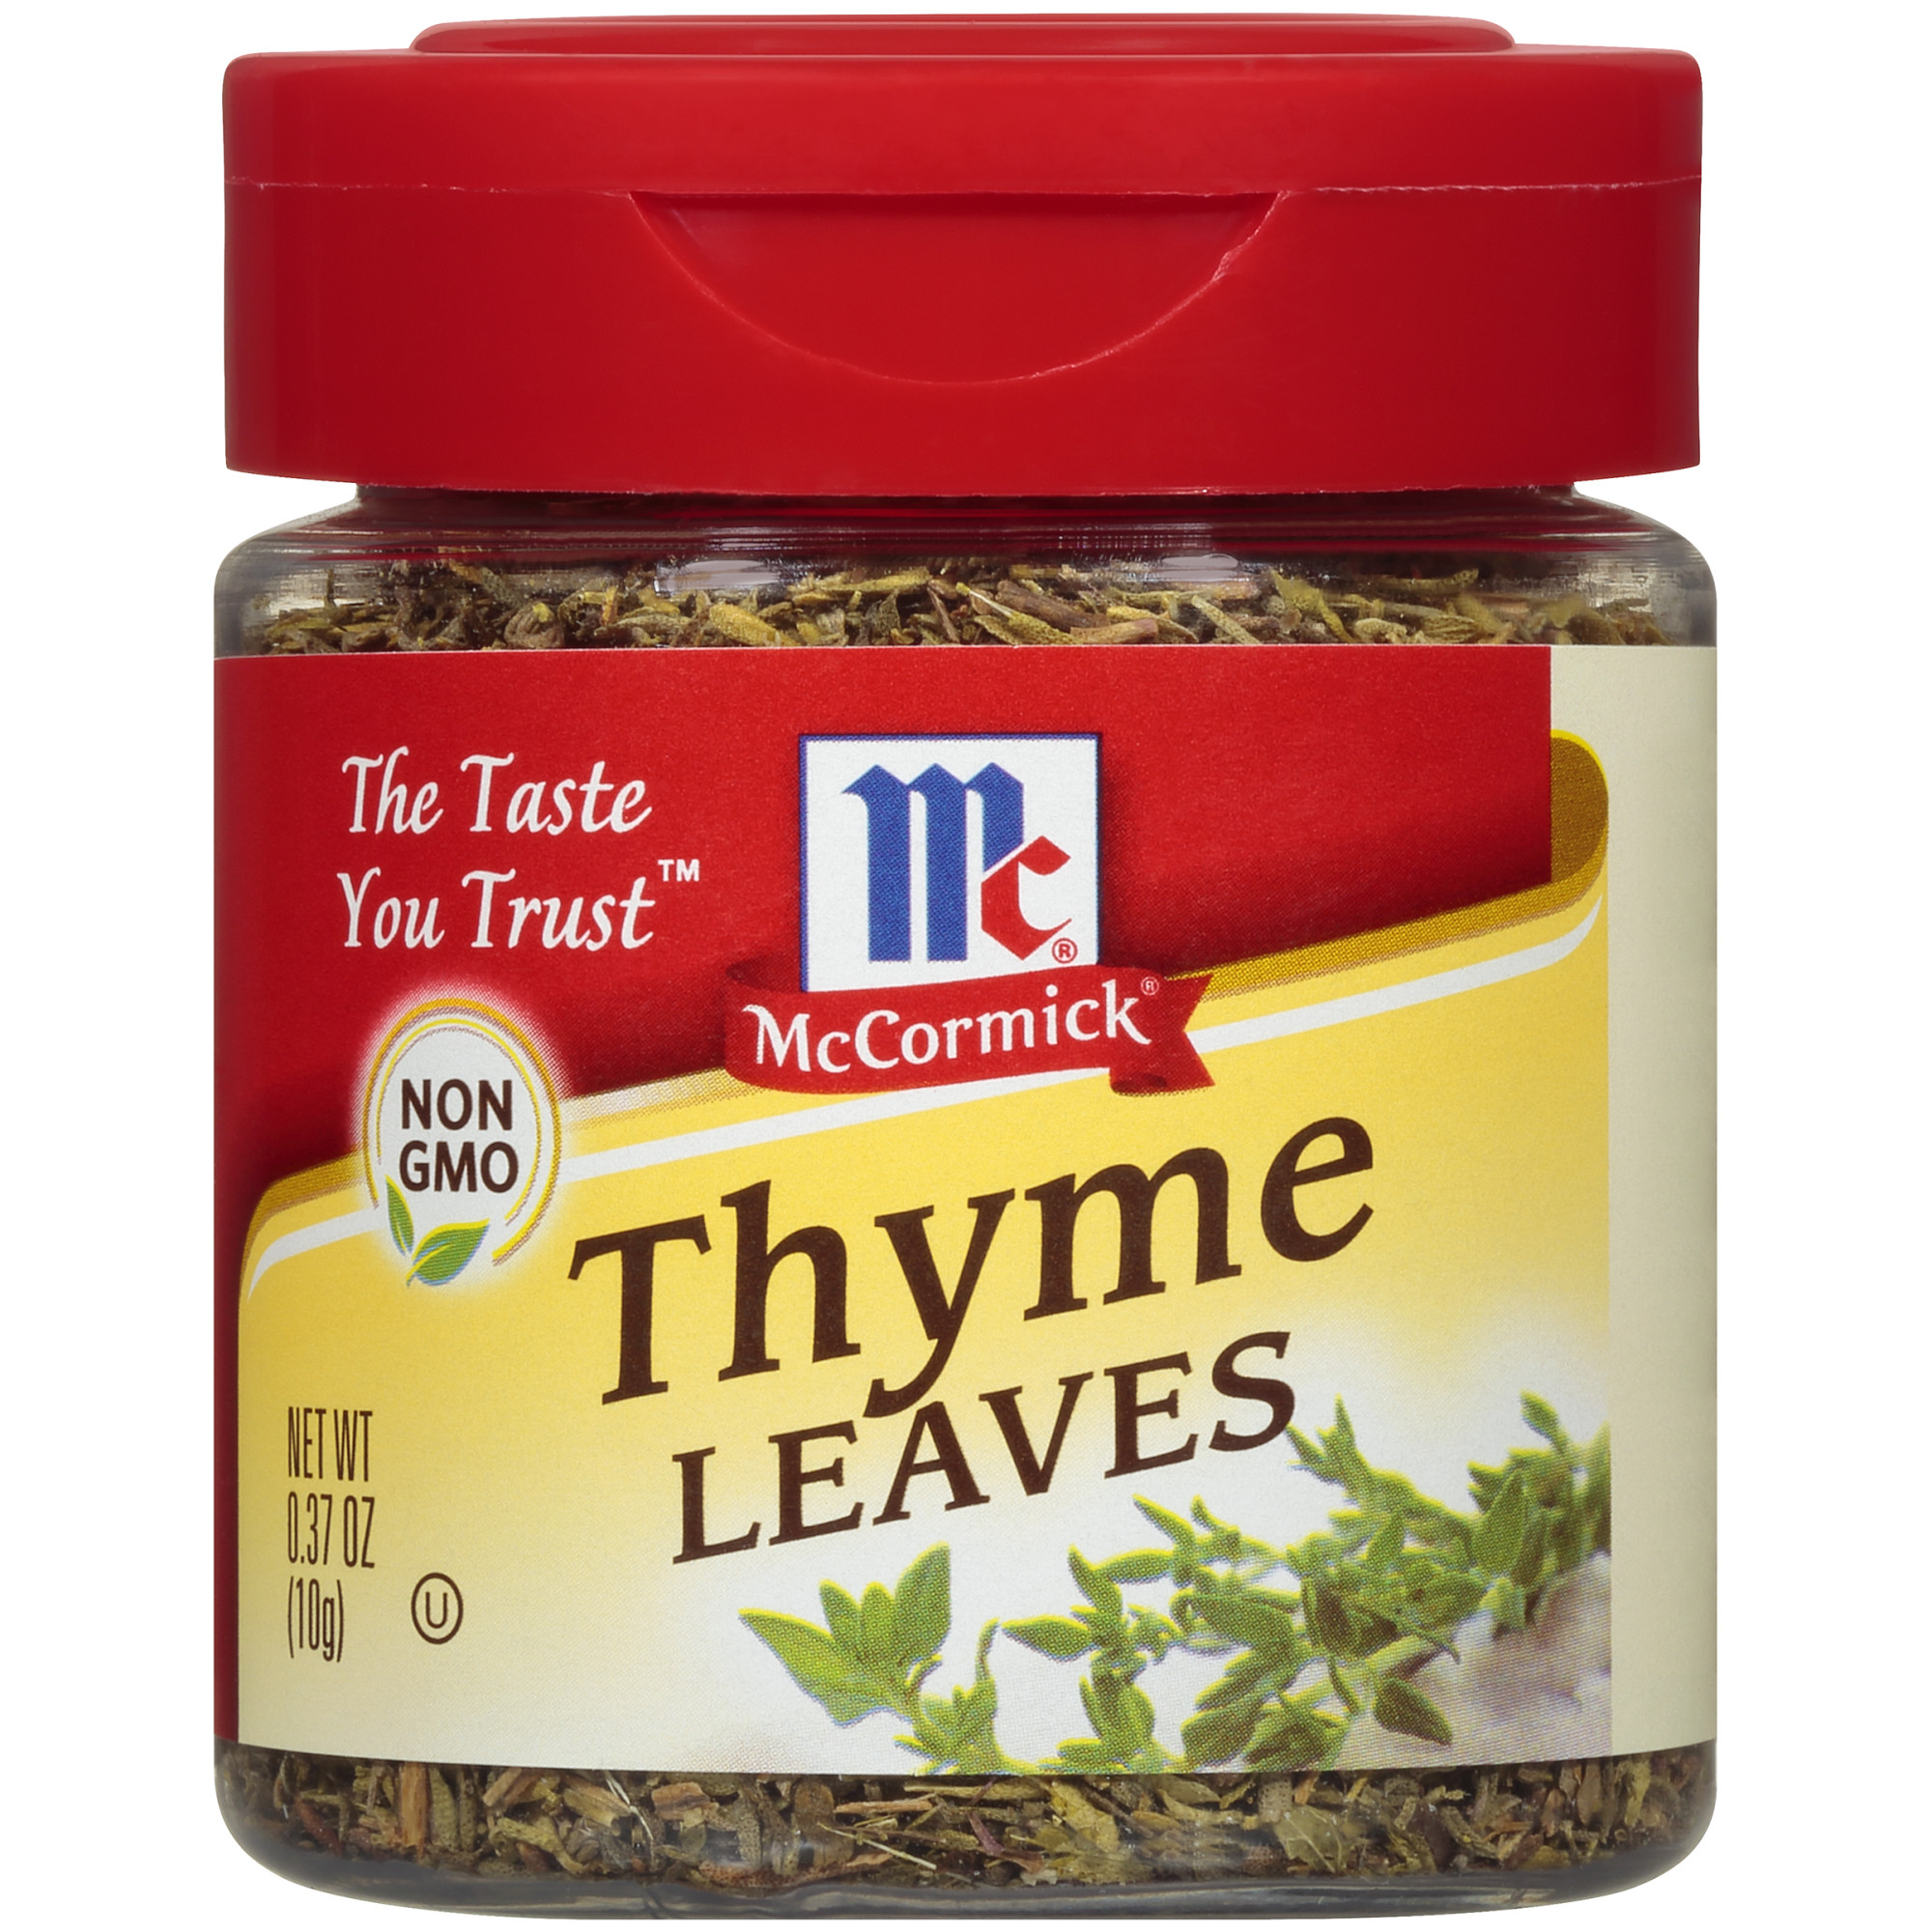 (2 Pack) McCormick Thyme Leaves, 0.37 Oz